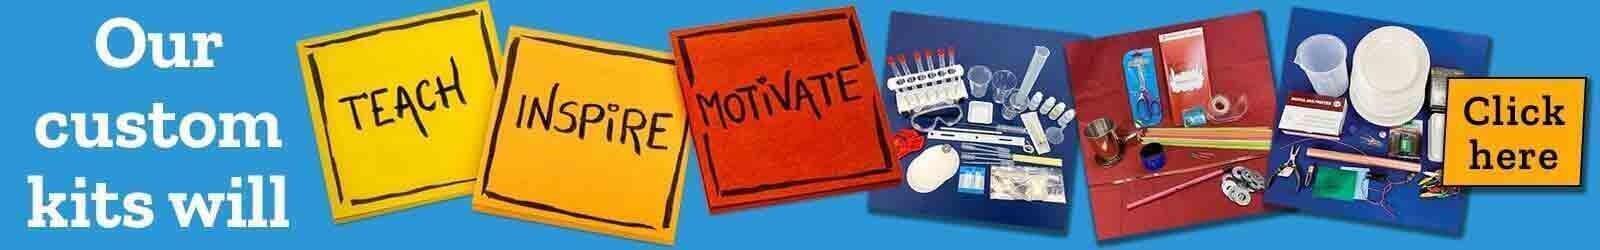 Our custom kits will teach inspire motivate